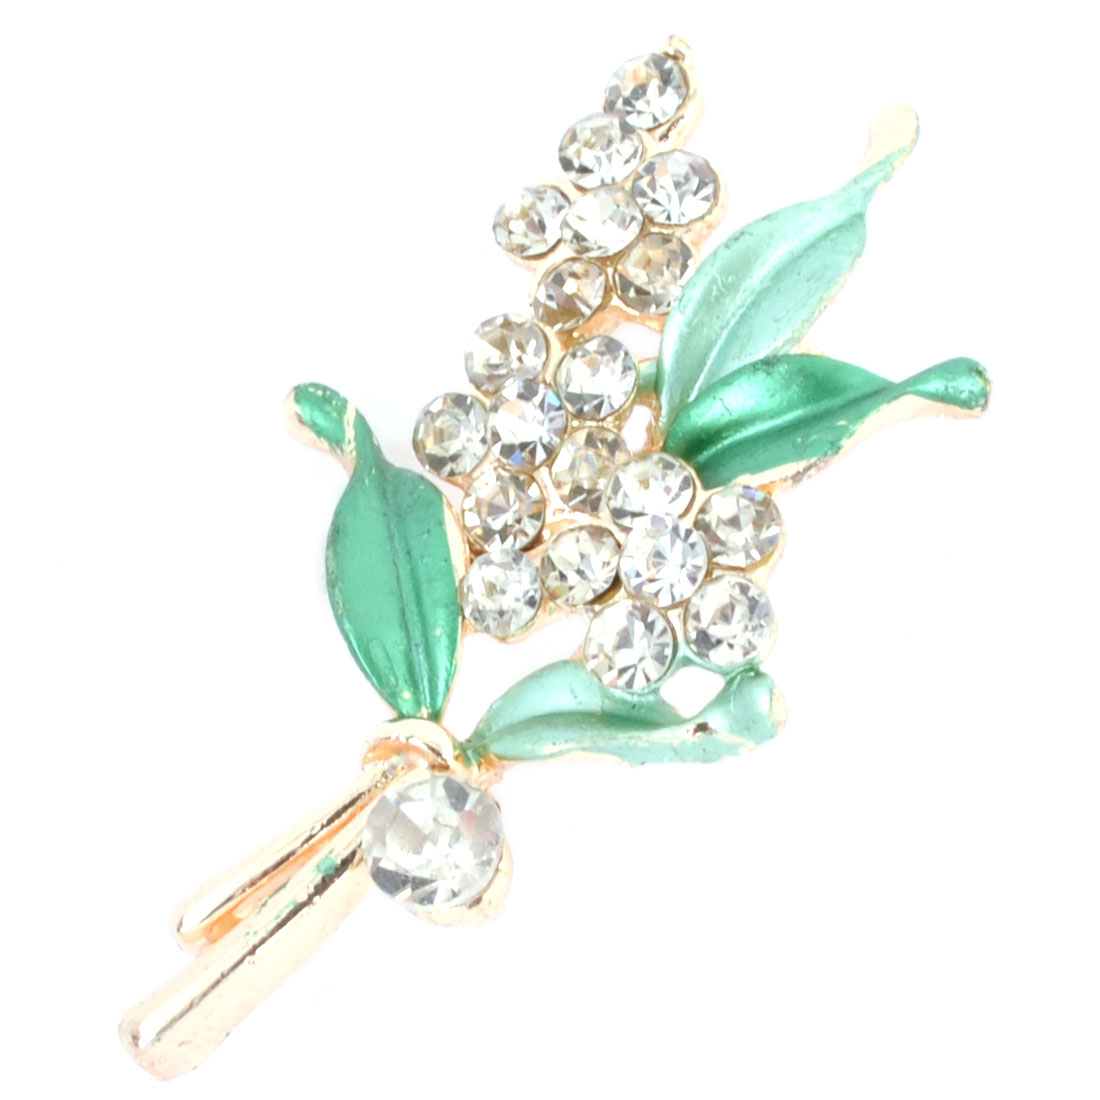 Woman Dress Adornment Rhinestone Accent Green Flower Pin Brooch Broach